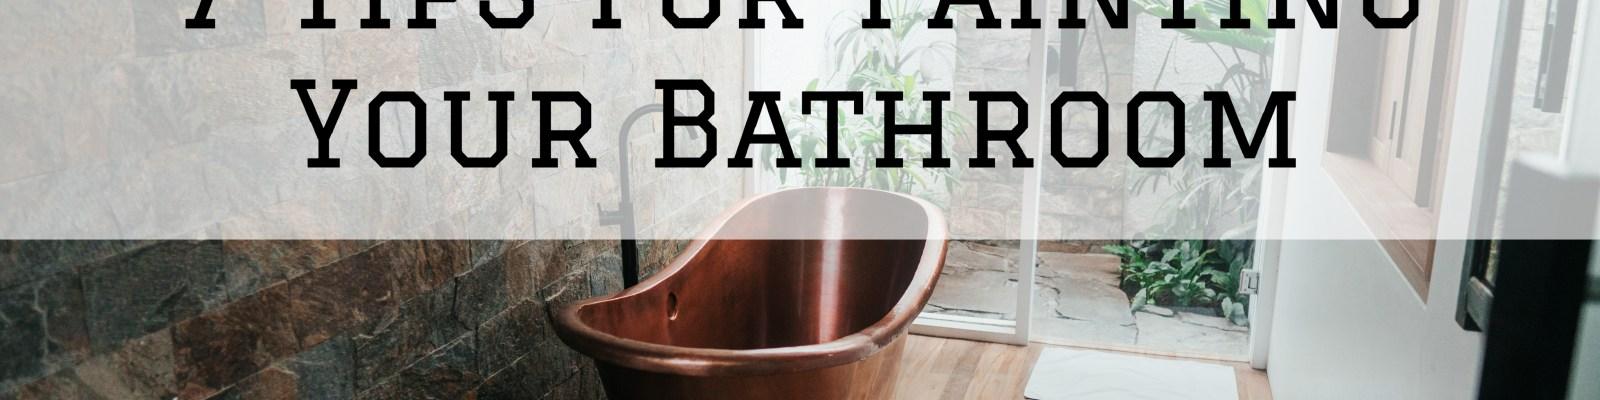 2021-04-23 Selah Painting St Louis MO Painting Bathroom Tips